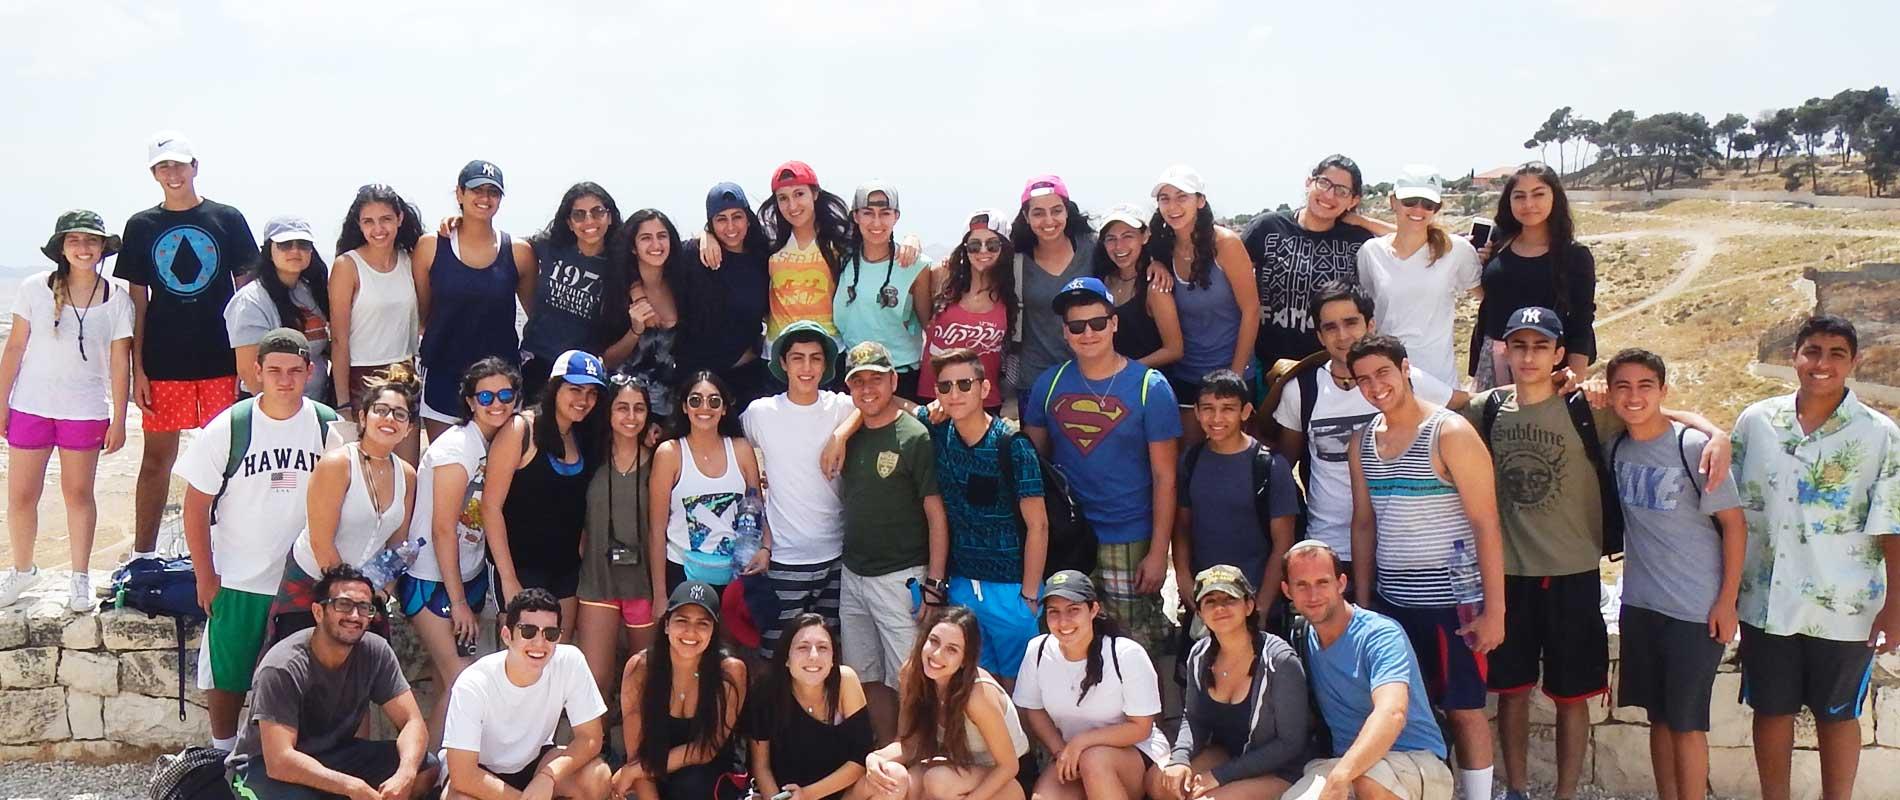 S.T.A.R Magen Teen Israel Trip